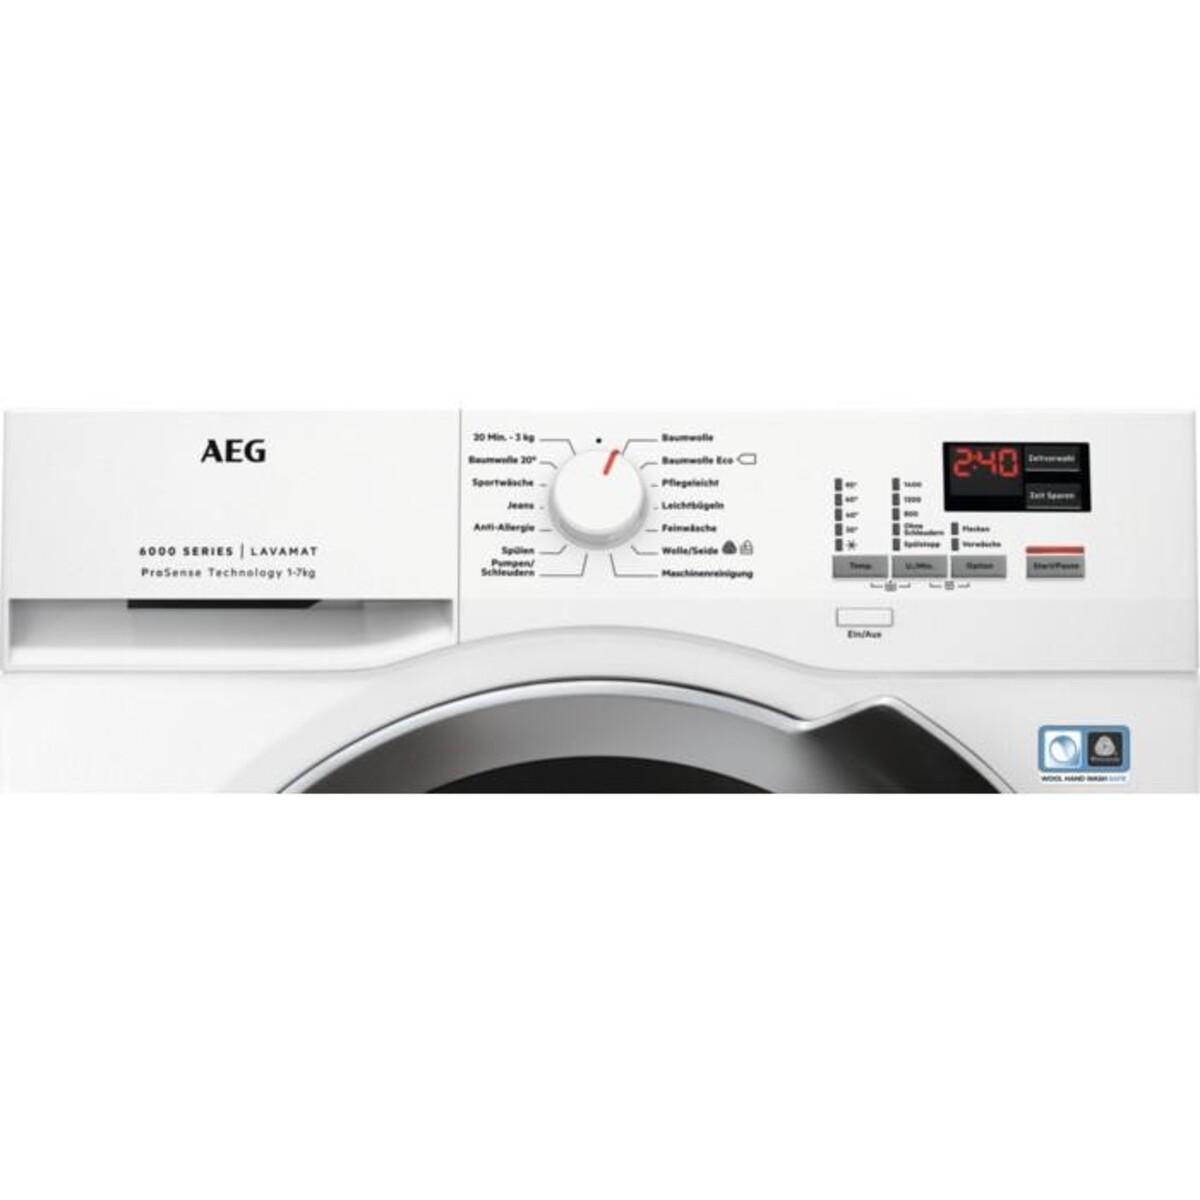 Bild 2 von AEG LAVAMAT L6FL700EX Waschmaschine (A+++, 7 kg, 1400 U/min, Display, Schontrommel, Aqua Control System, Alarm, XXL)